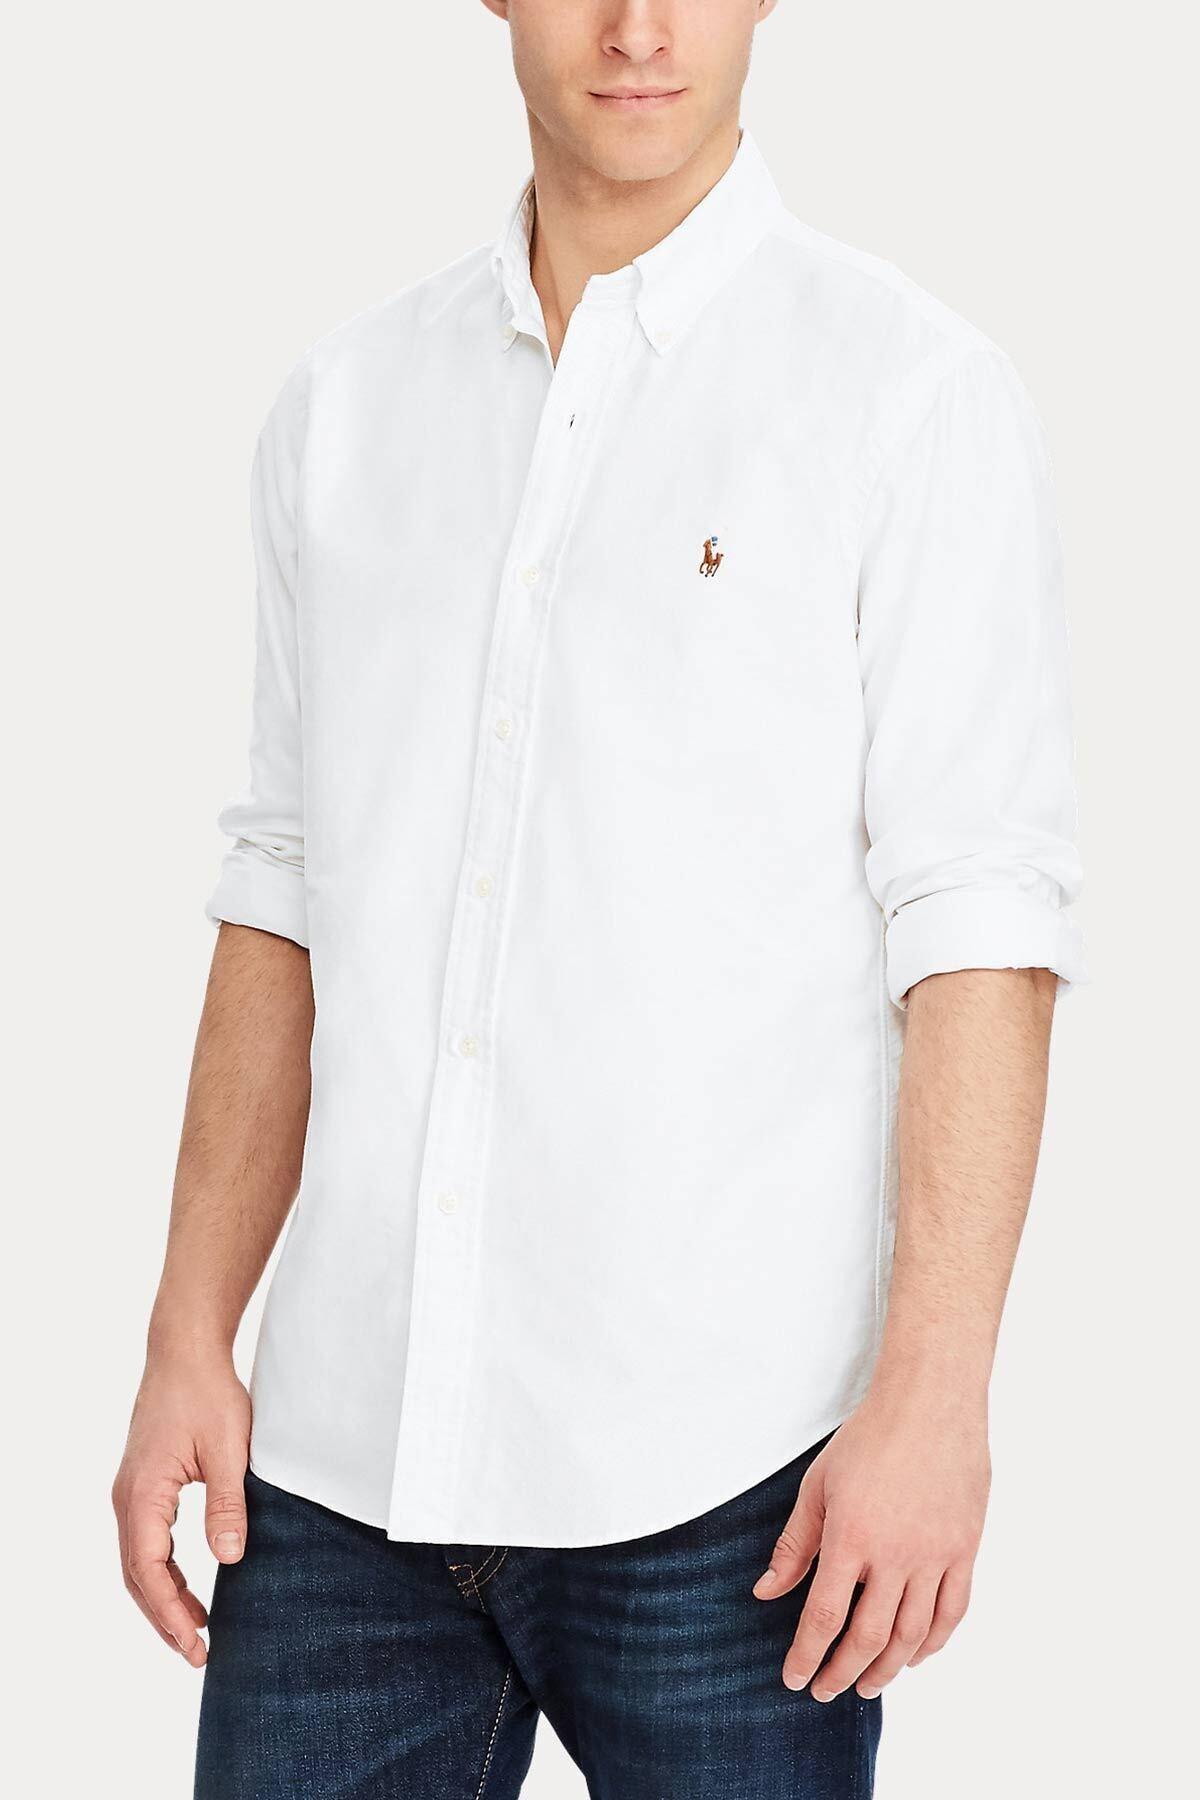 Polo Ralph Lauren Erkek Beyaz Slim Fit Oxford Gömlek 1